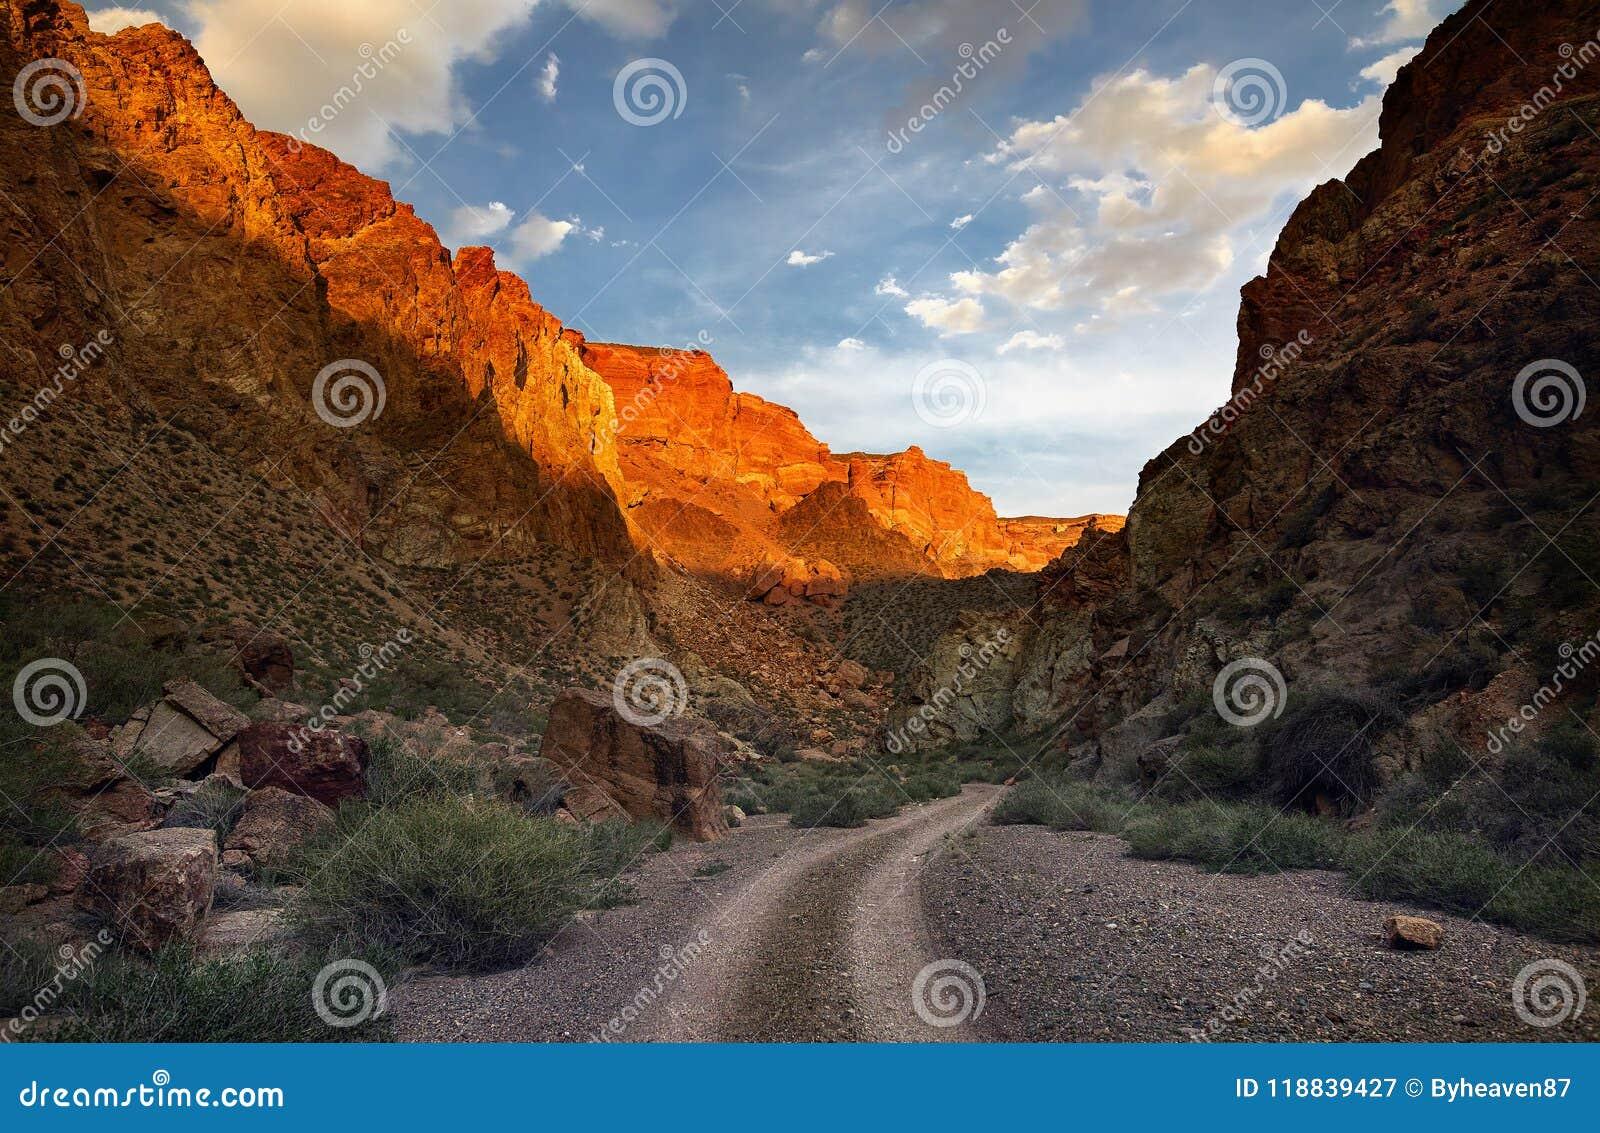 Каньон в пустыне на заходе солнца